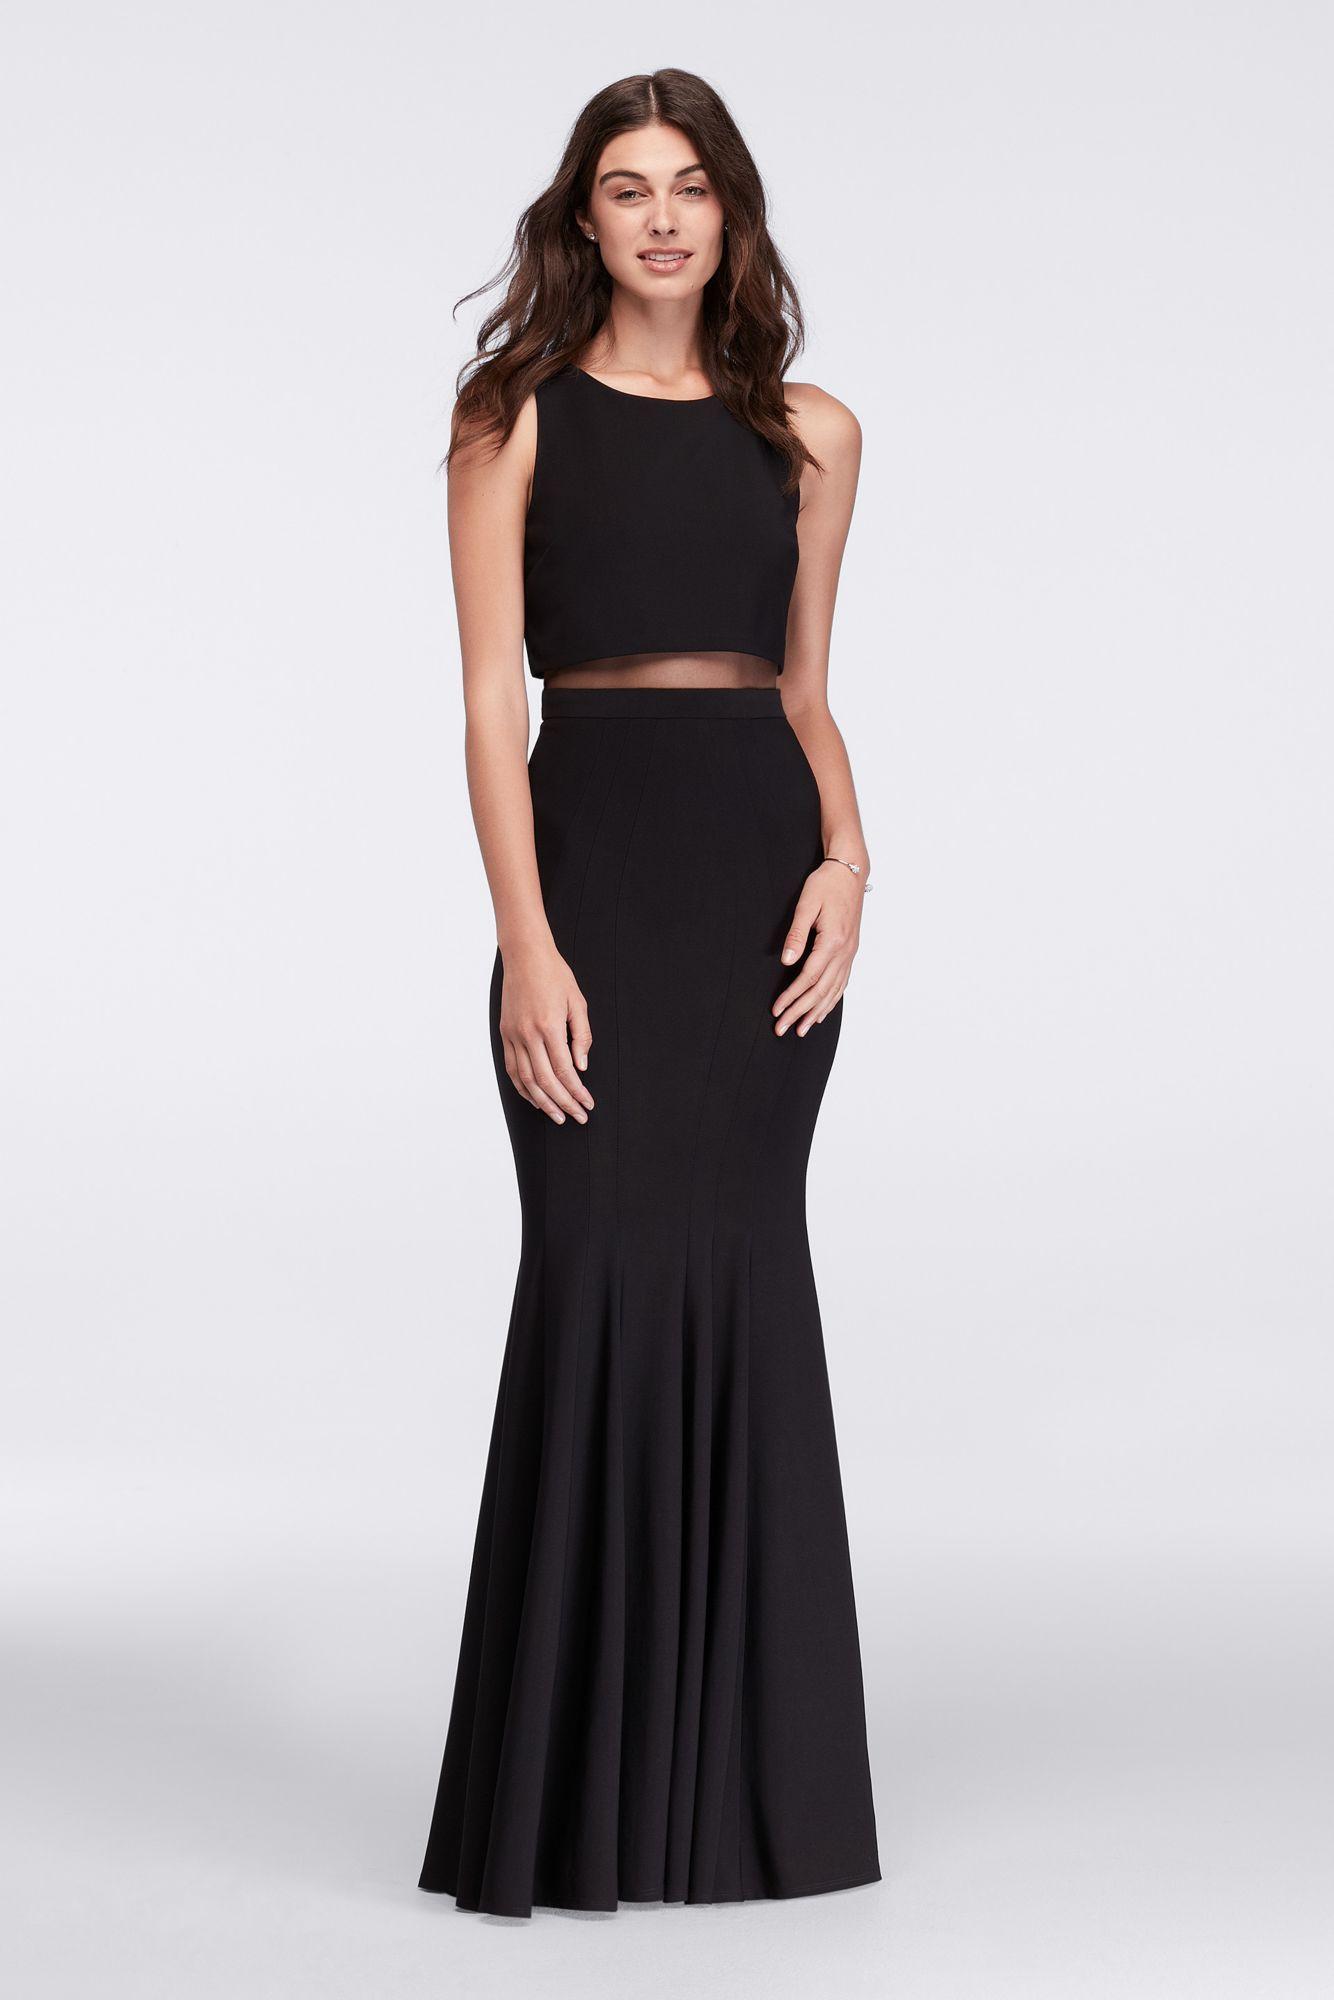 A18457 Style Long Illusion Mermaid Formal Dress Dresses